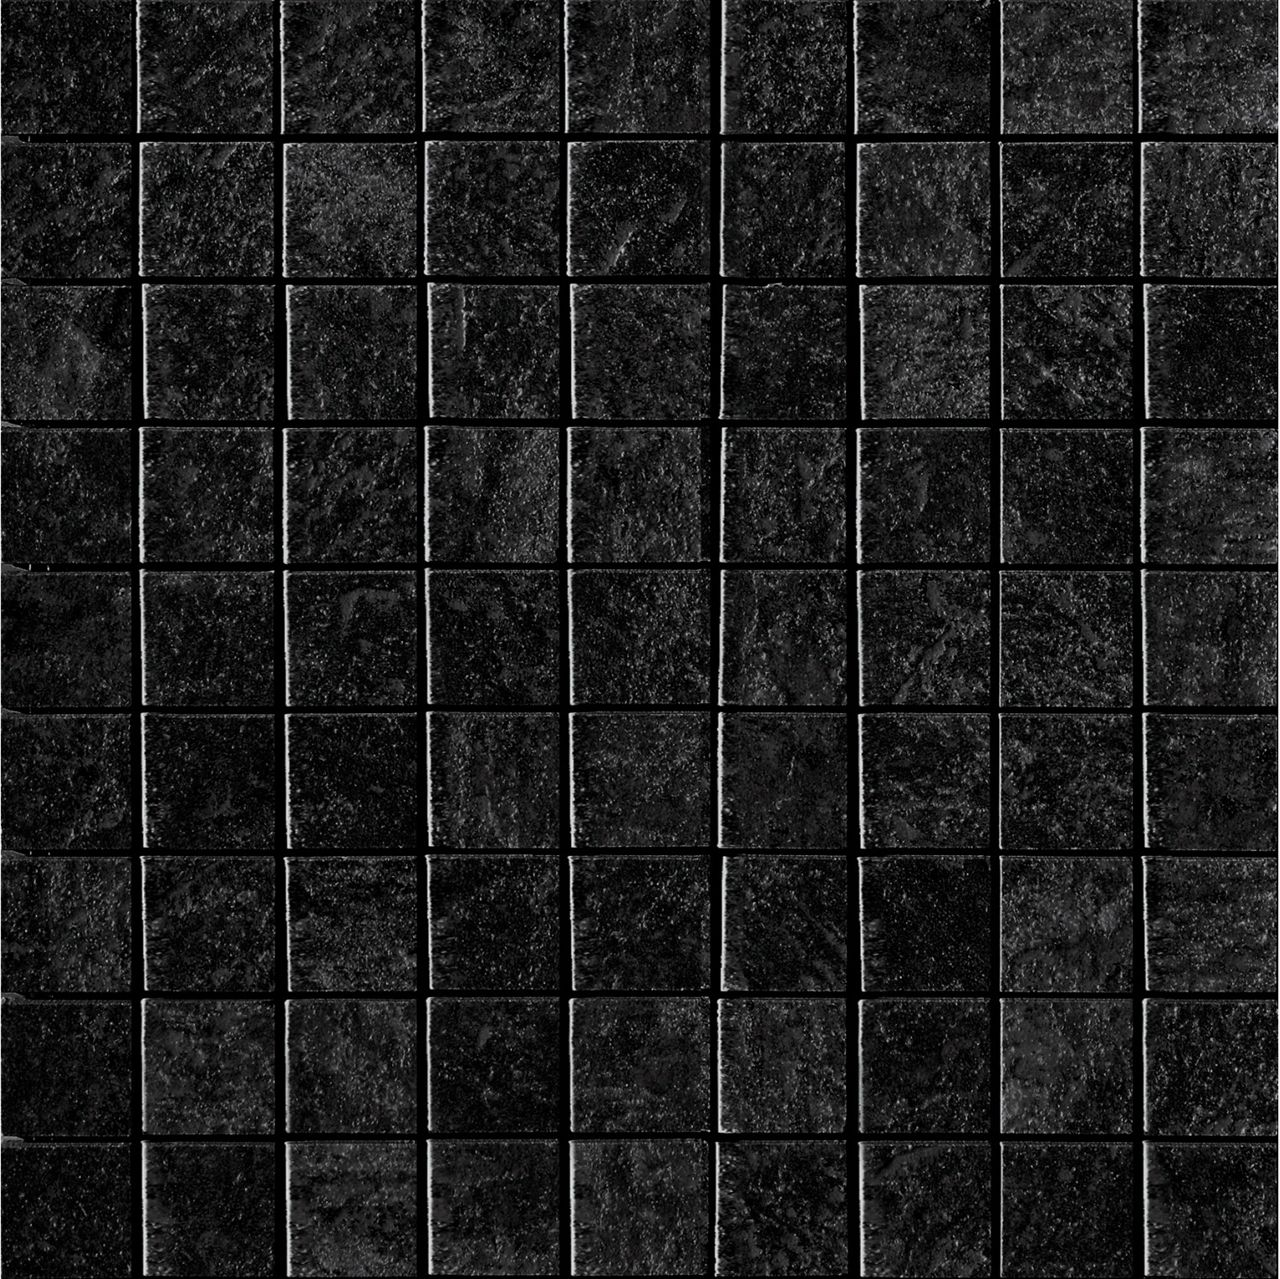 Show Details For Imola Colosseum Black Square Mosaic Wall